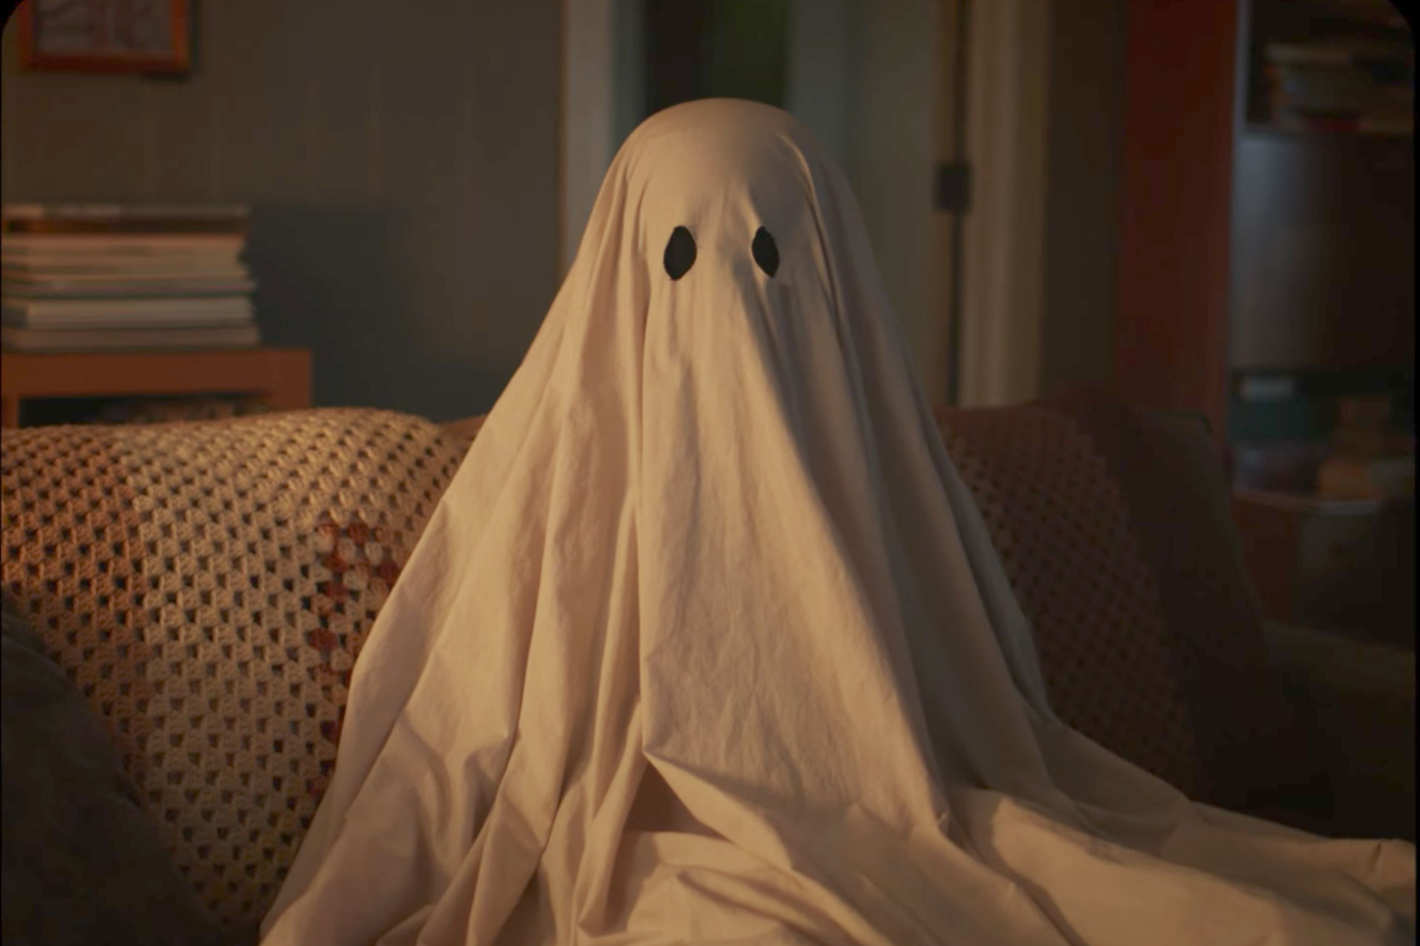 07-a-ghost-story.w710.h473.2x.jpg